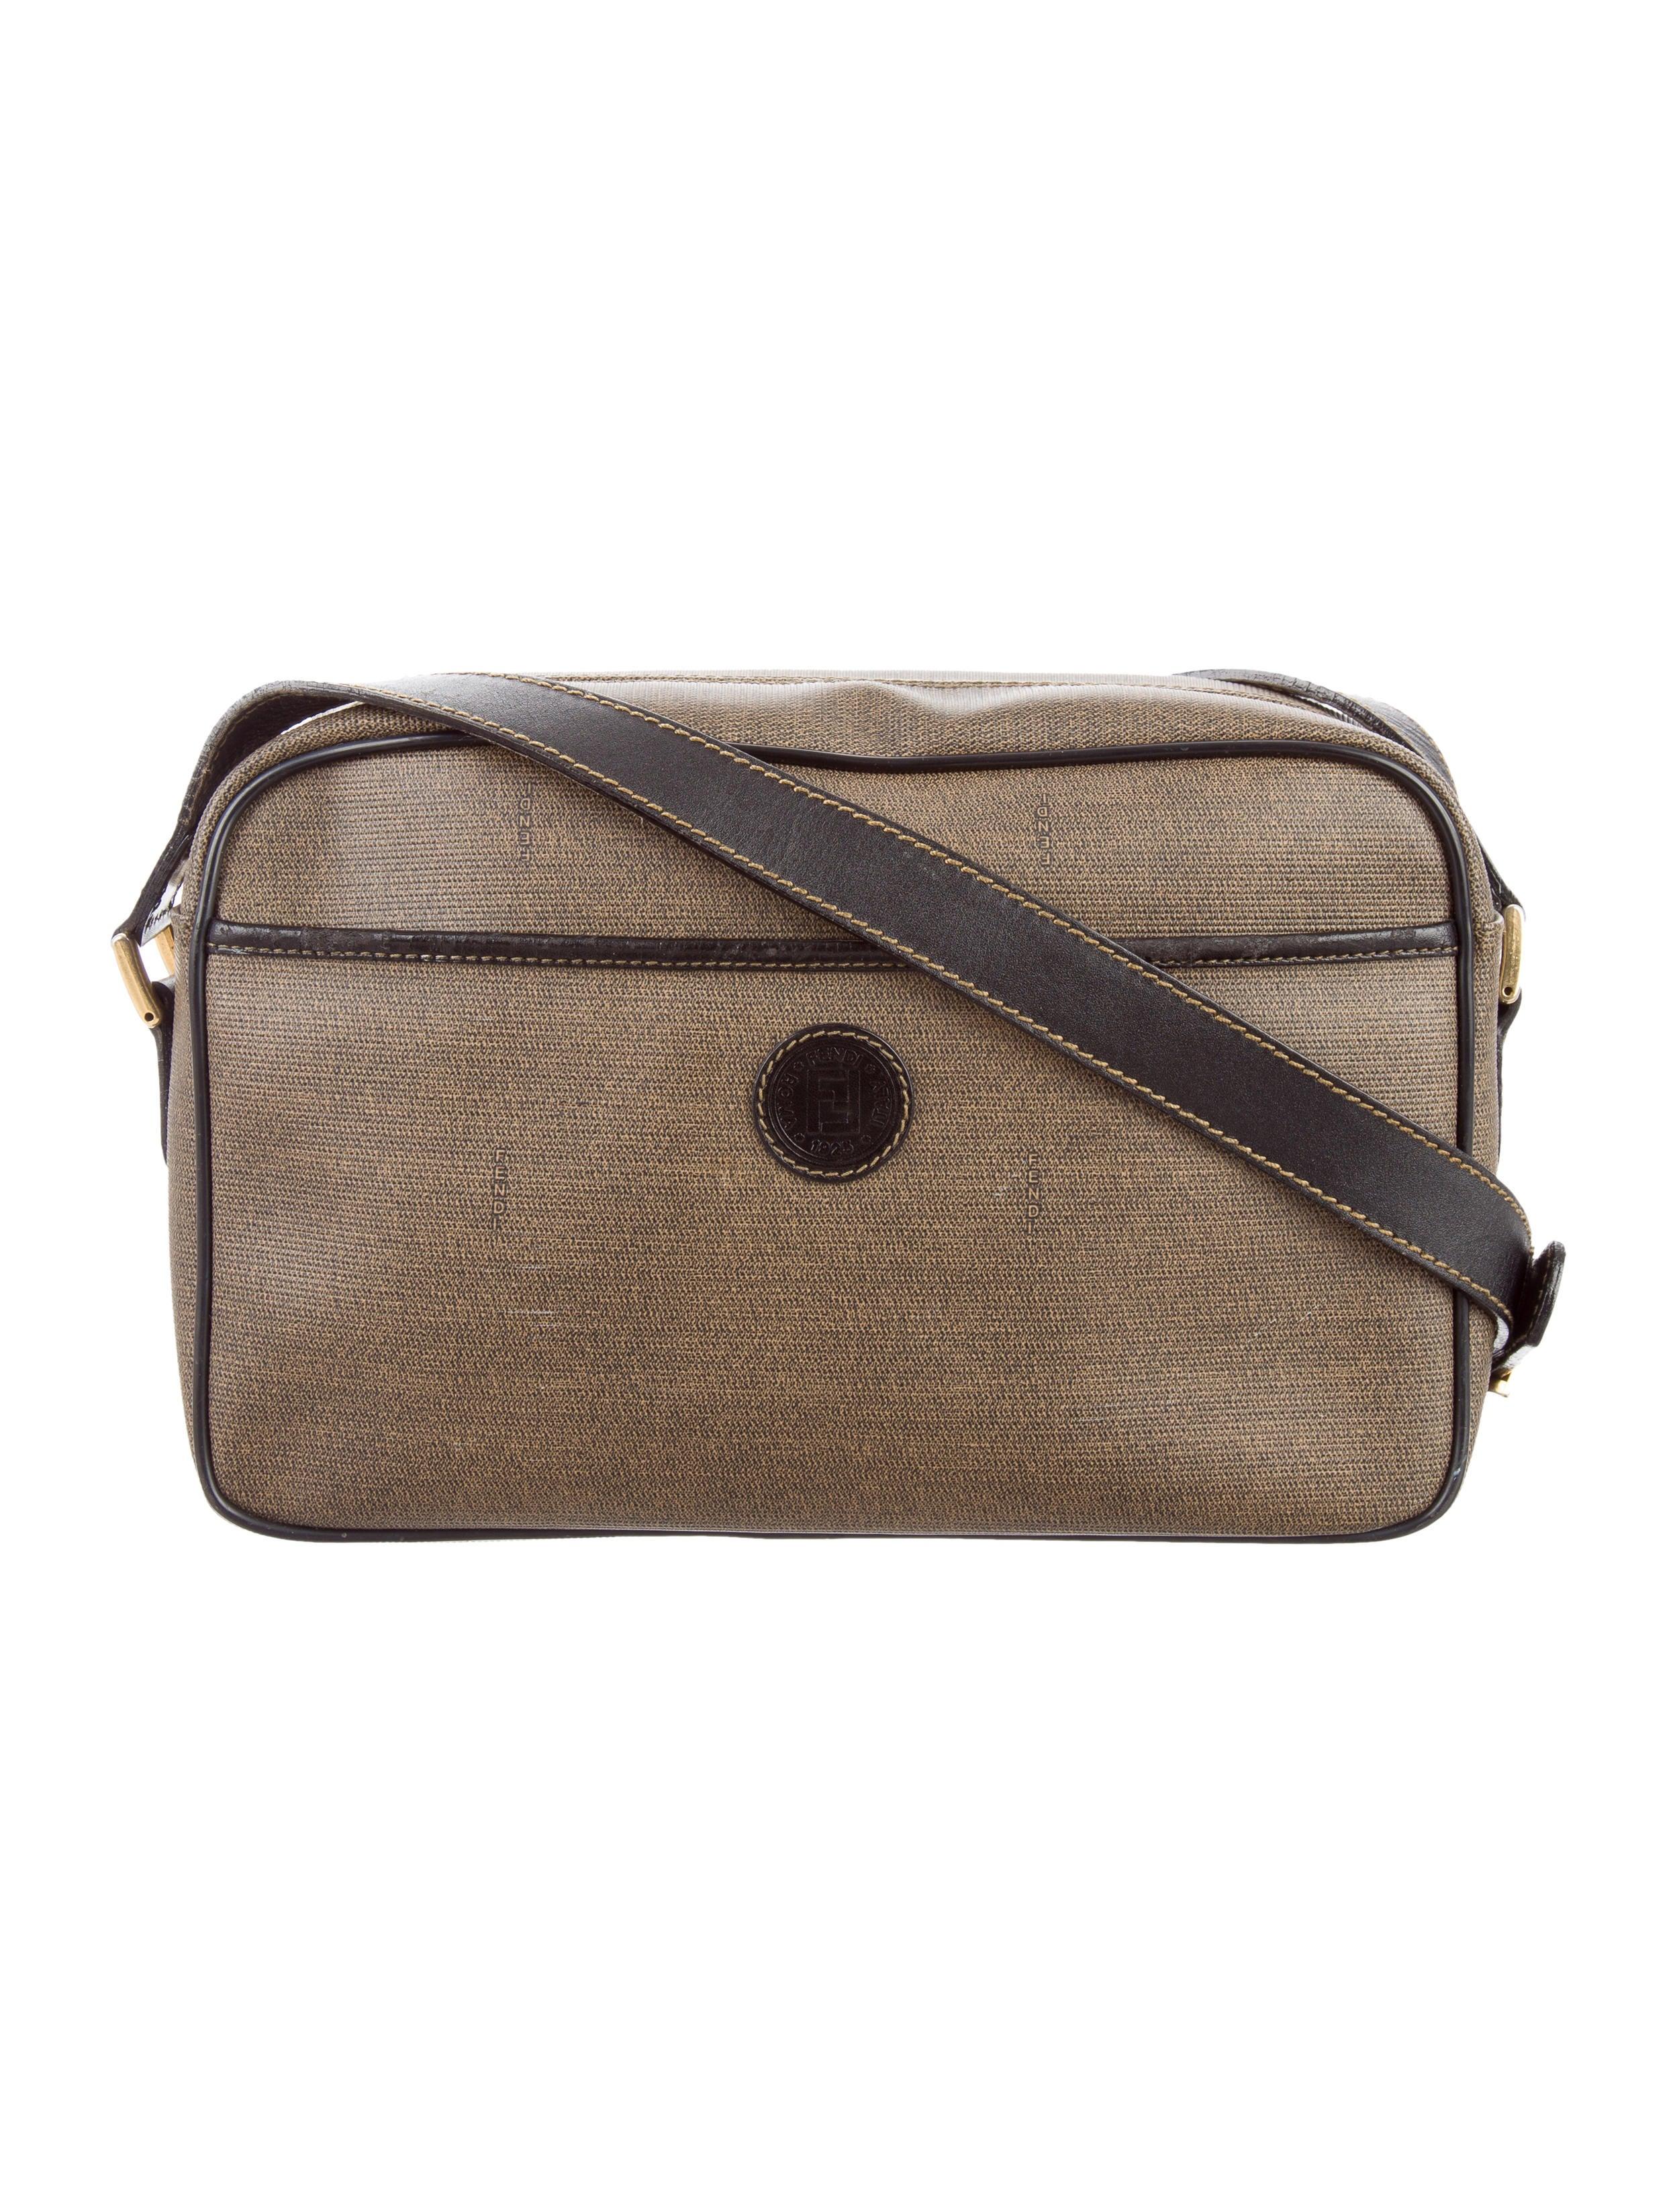 2e128c7334 Fendi Vintage Leather Trimmed Crossbody Bag - Handbags - FEN59272